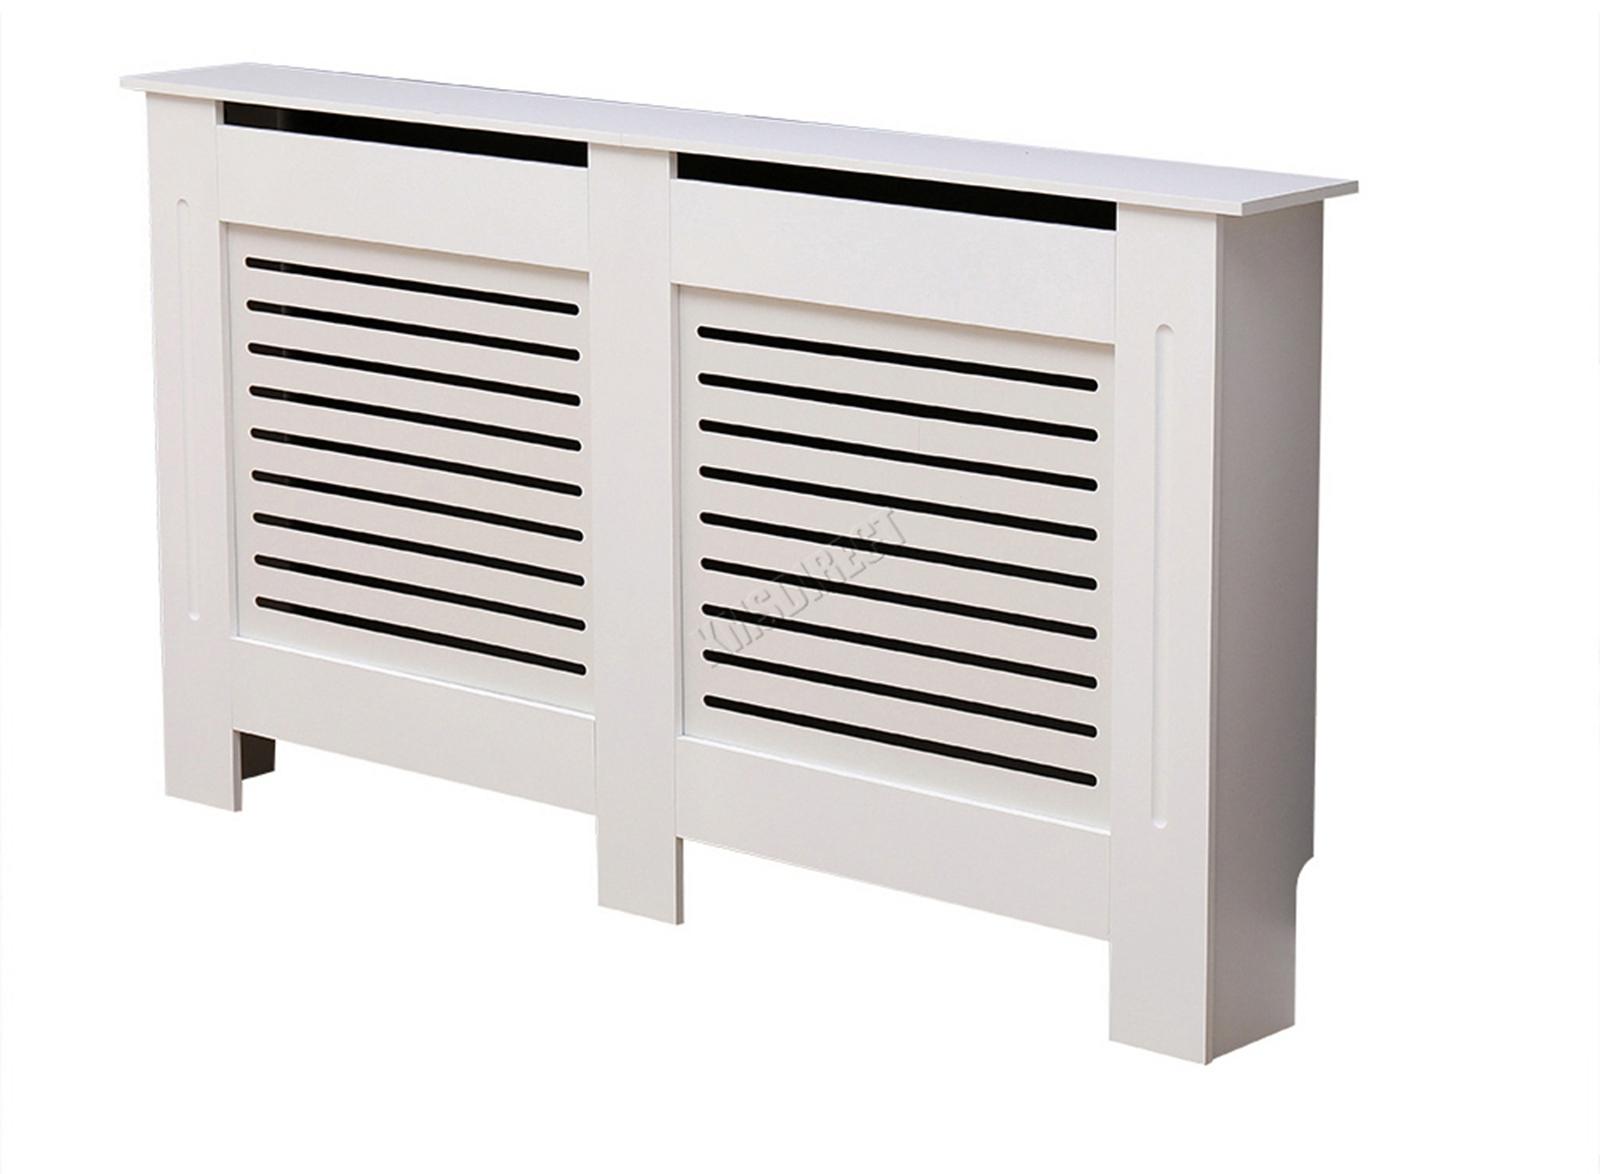 Modern WestWood Radiator Cover Grey Wooden Radiator Wall Shelves Cabinet